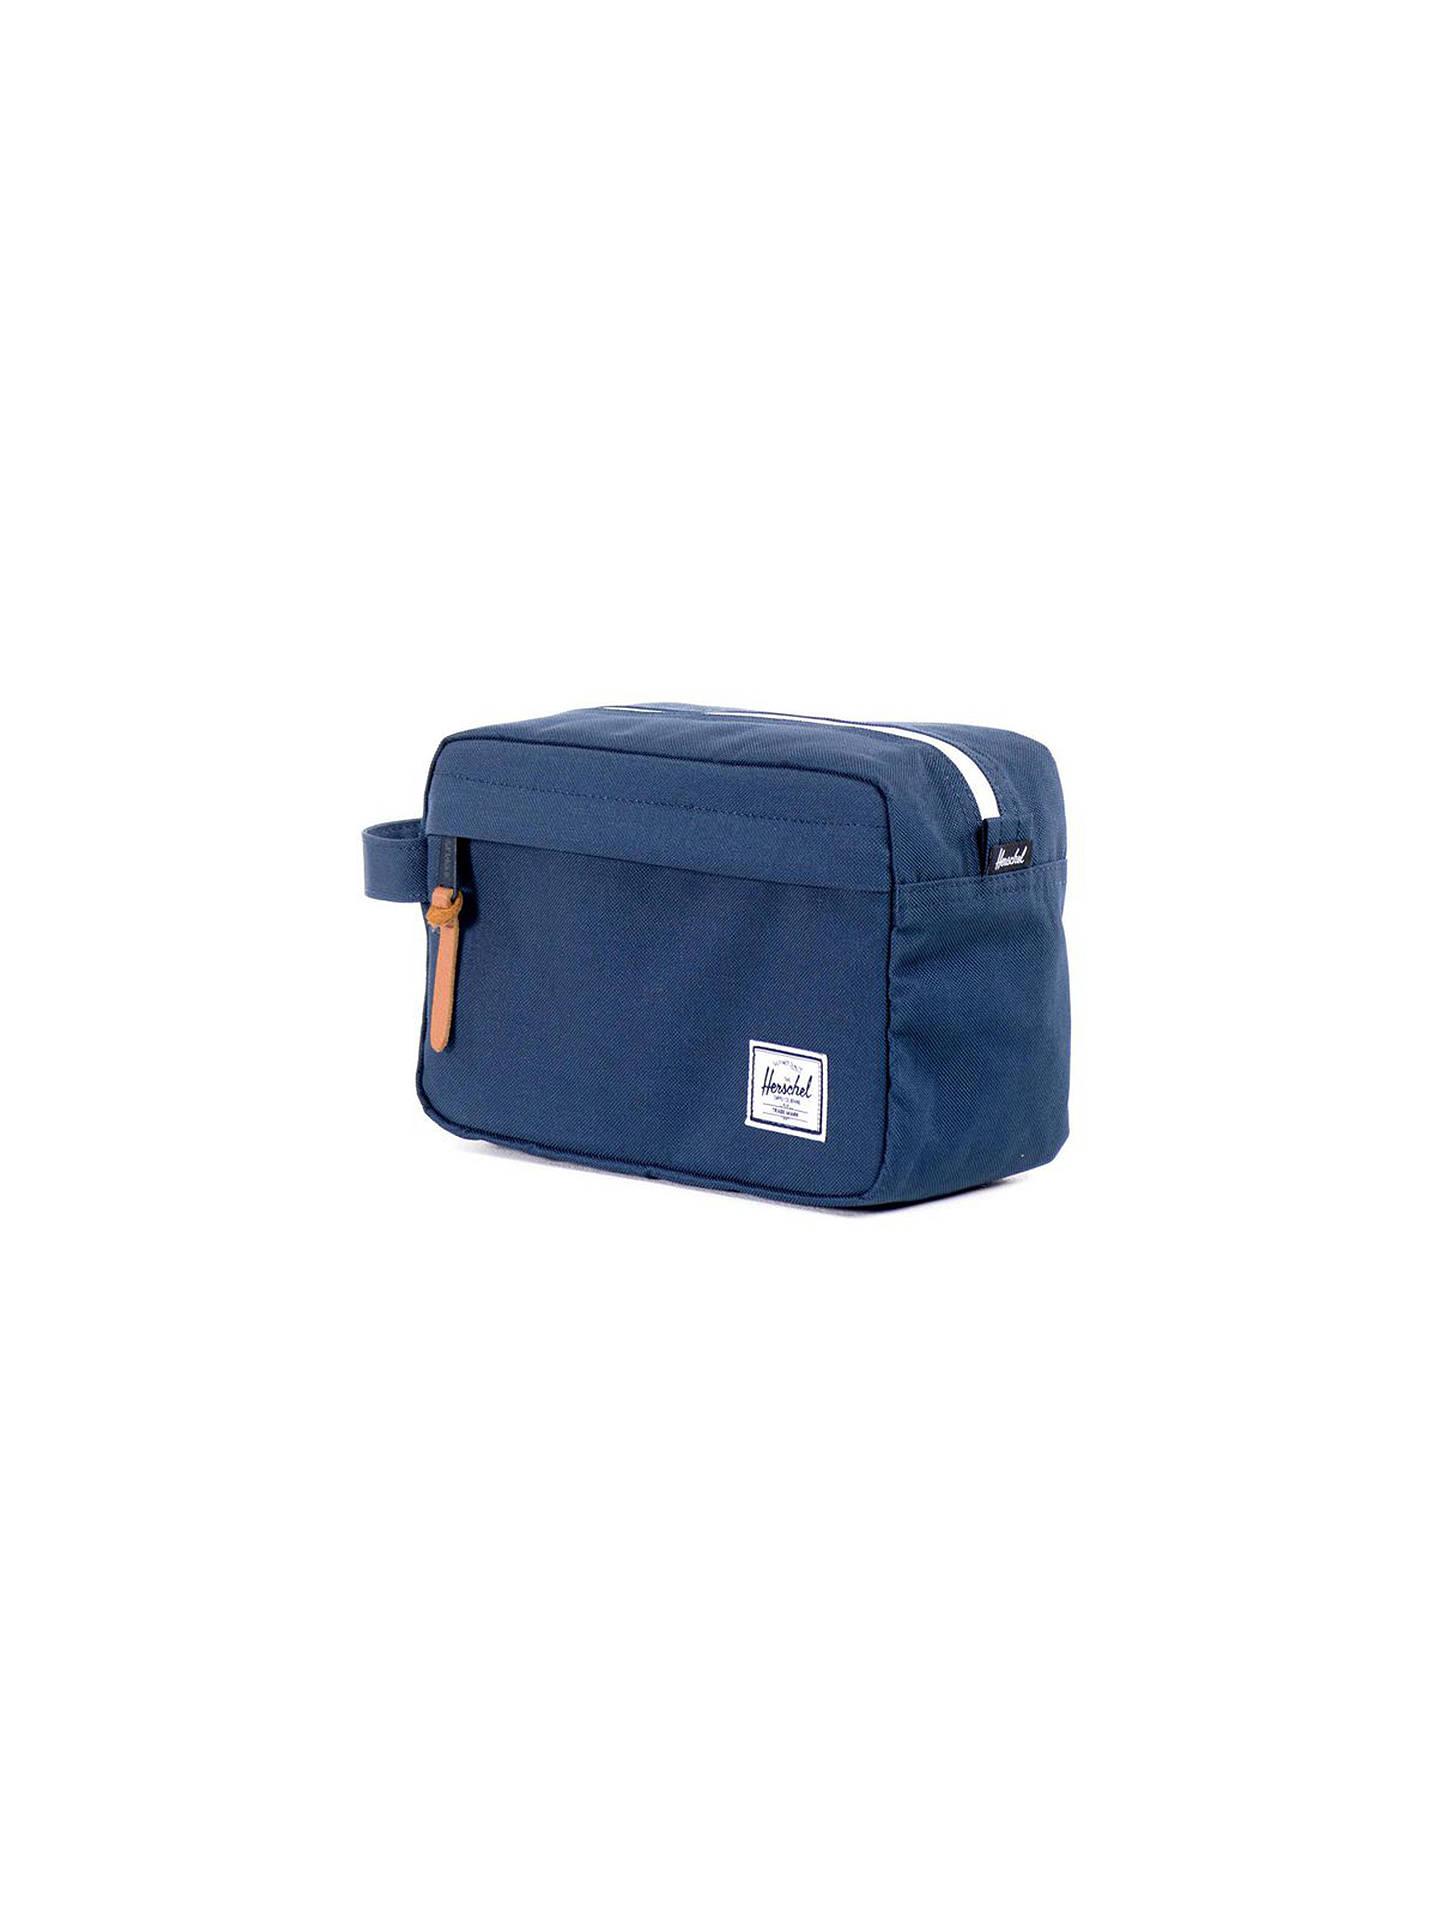 3949ac98bfcb Herschel Supply Co. Chapter Wash Bag at John Lewis & Partners